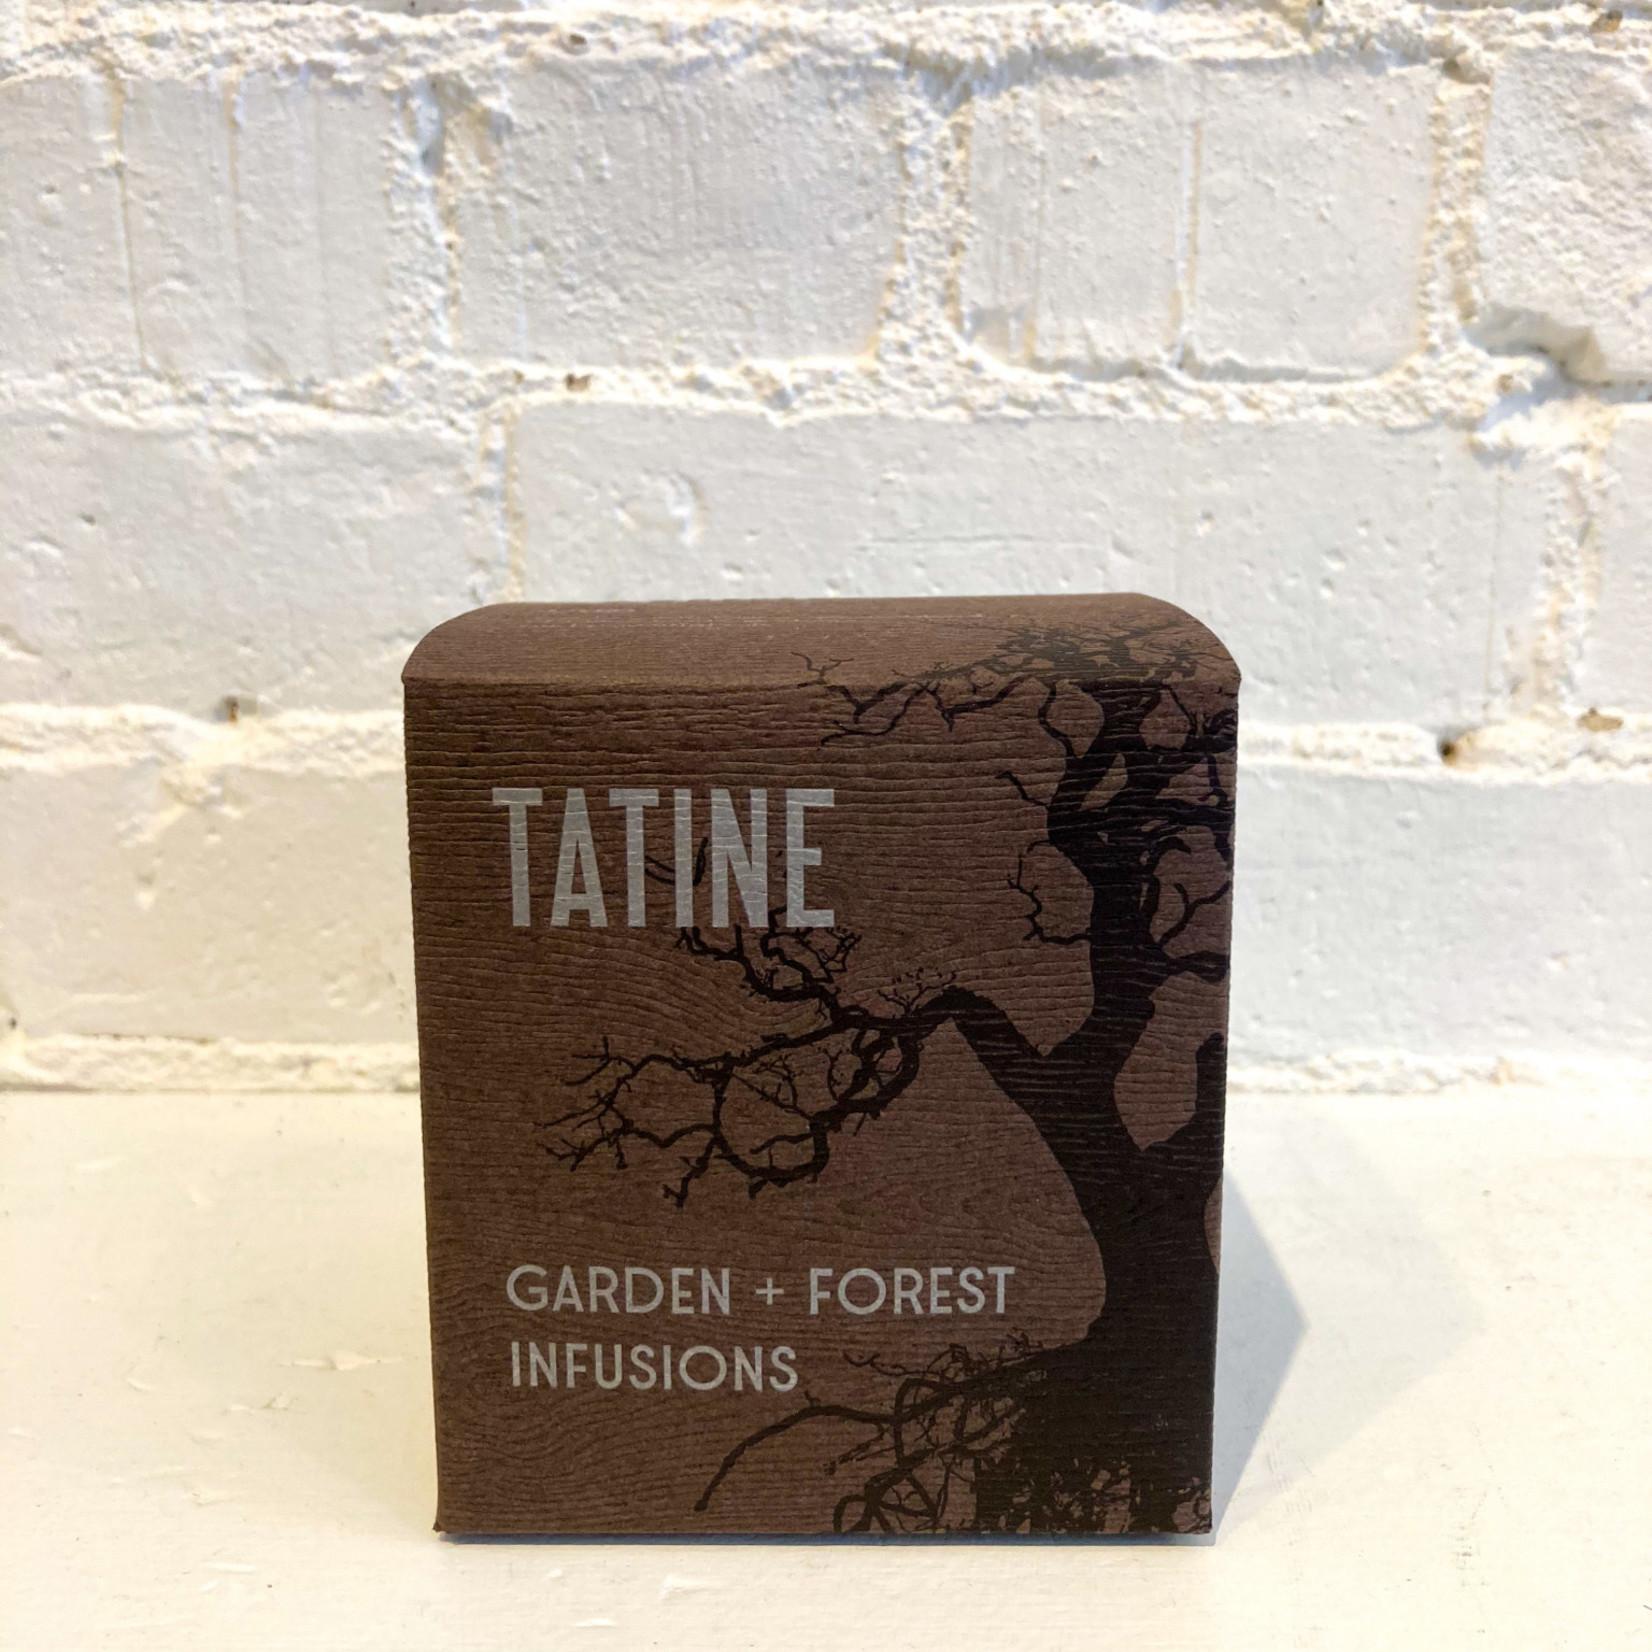 Tatine Pine Candle